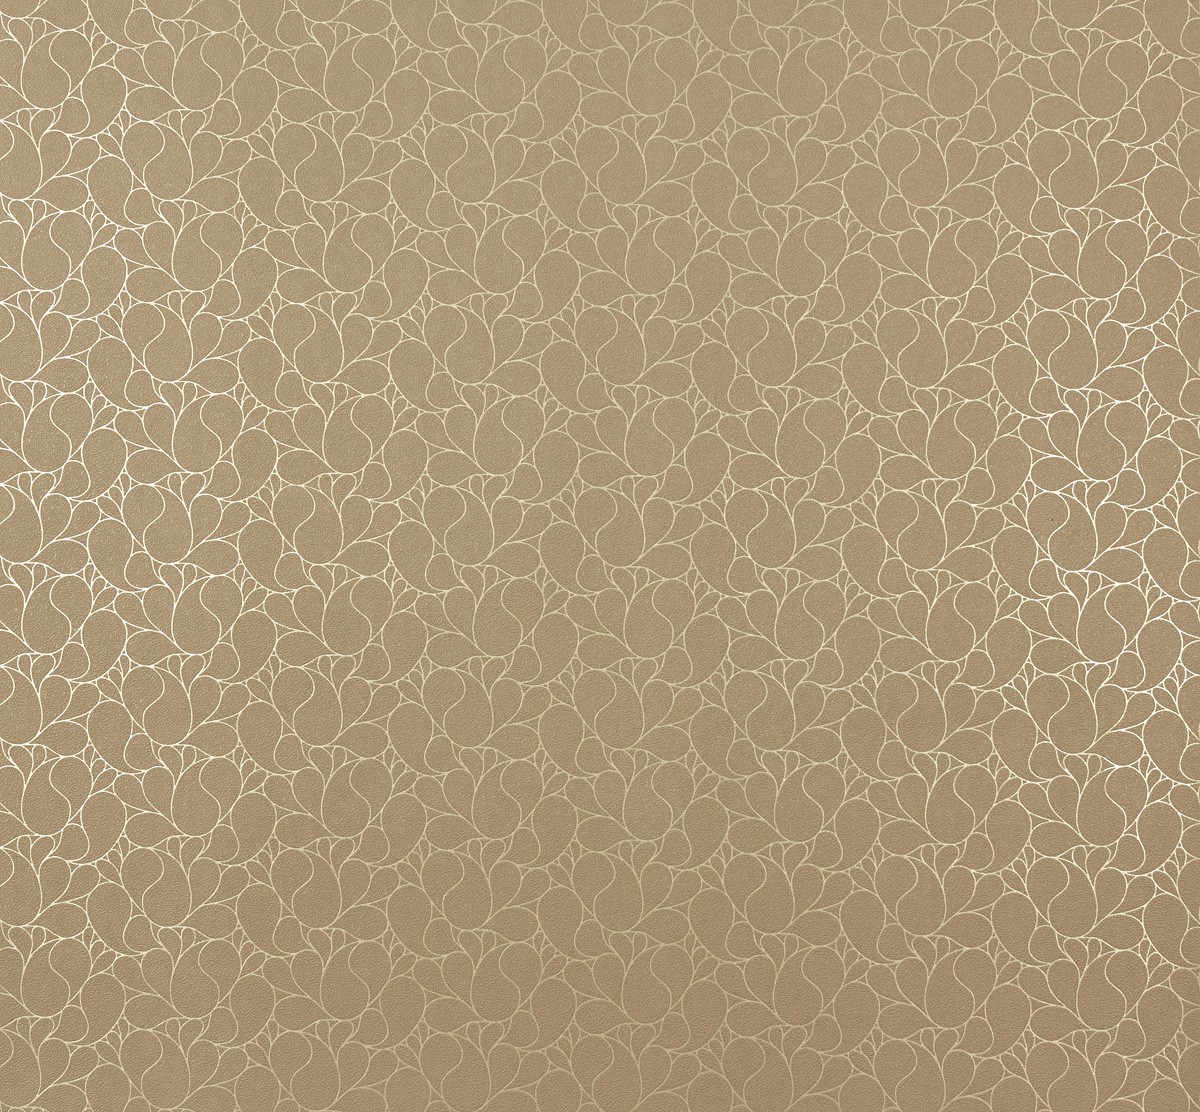 vliestapete marburg messina tapete 55419 uni desihn beige. Black Bedroom Furniture Sets. Home Design Ideas